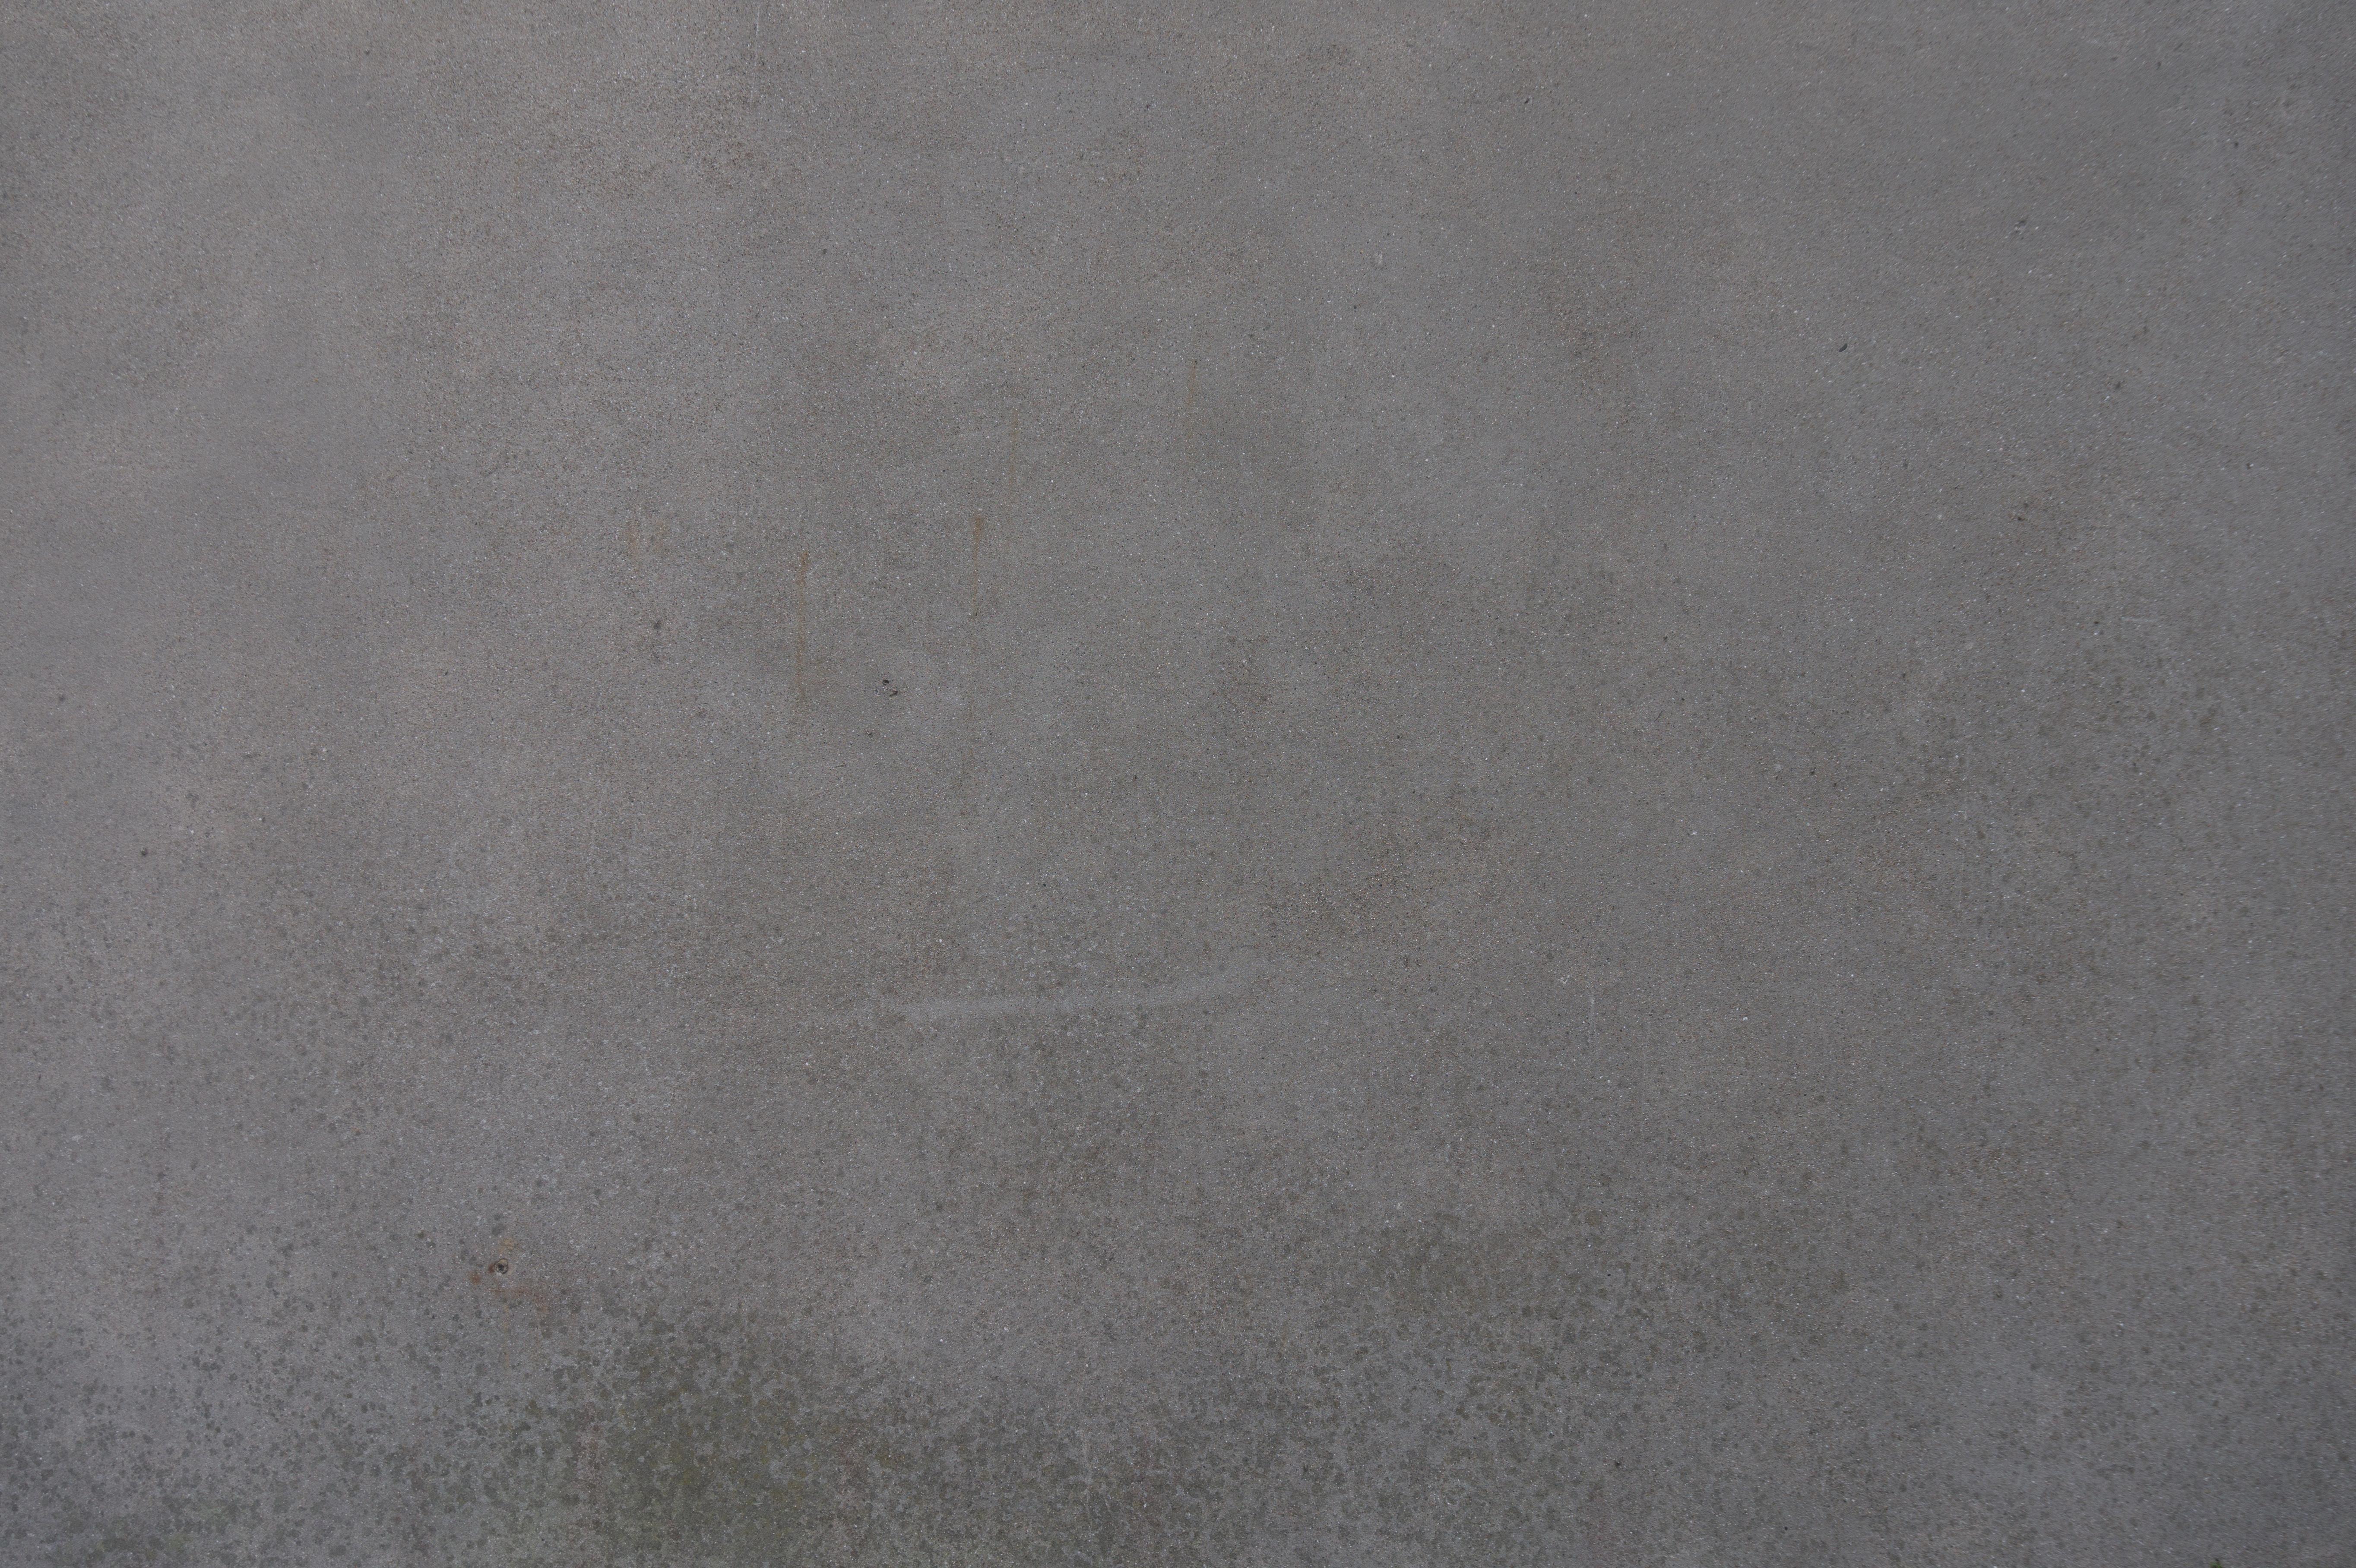 Dark Grey Plain Concrete Concrete Texturify Free Textures